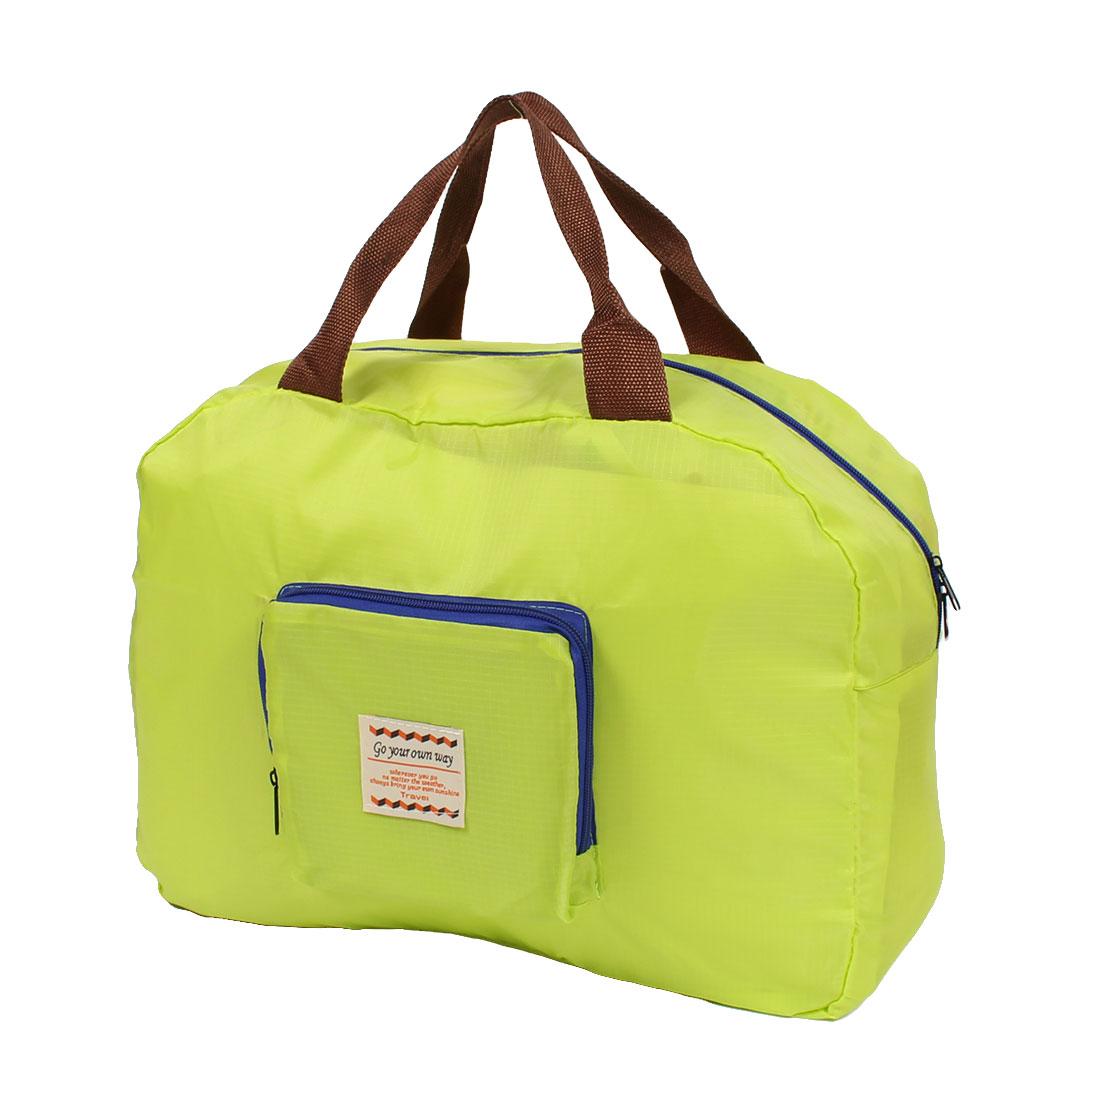 Travel Shopping Foldable Luggage Clothes Storage Bag Organizer Light Green